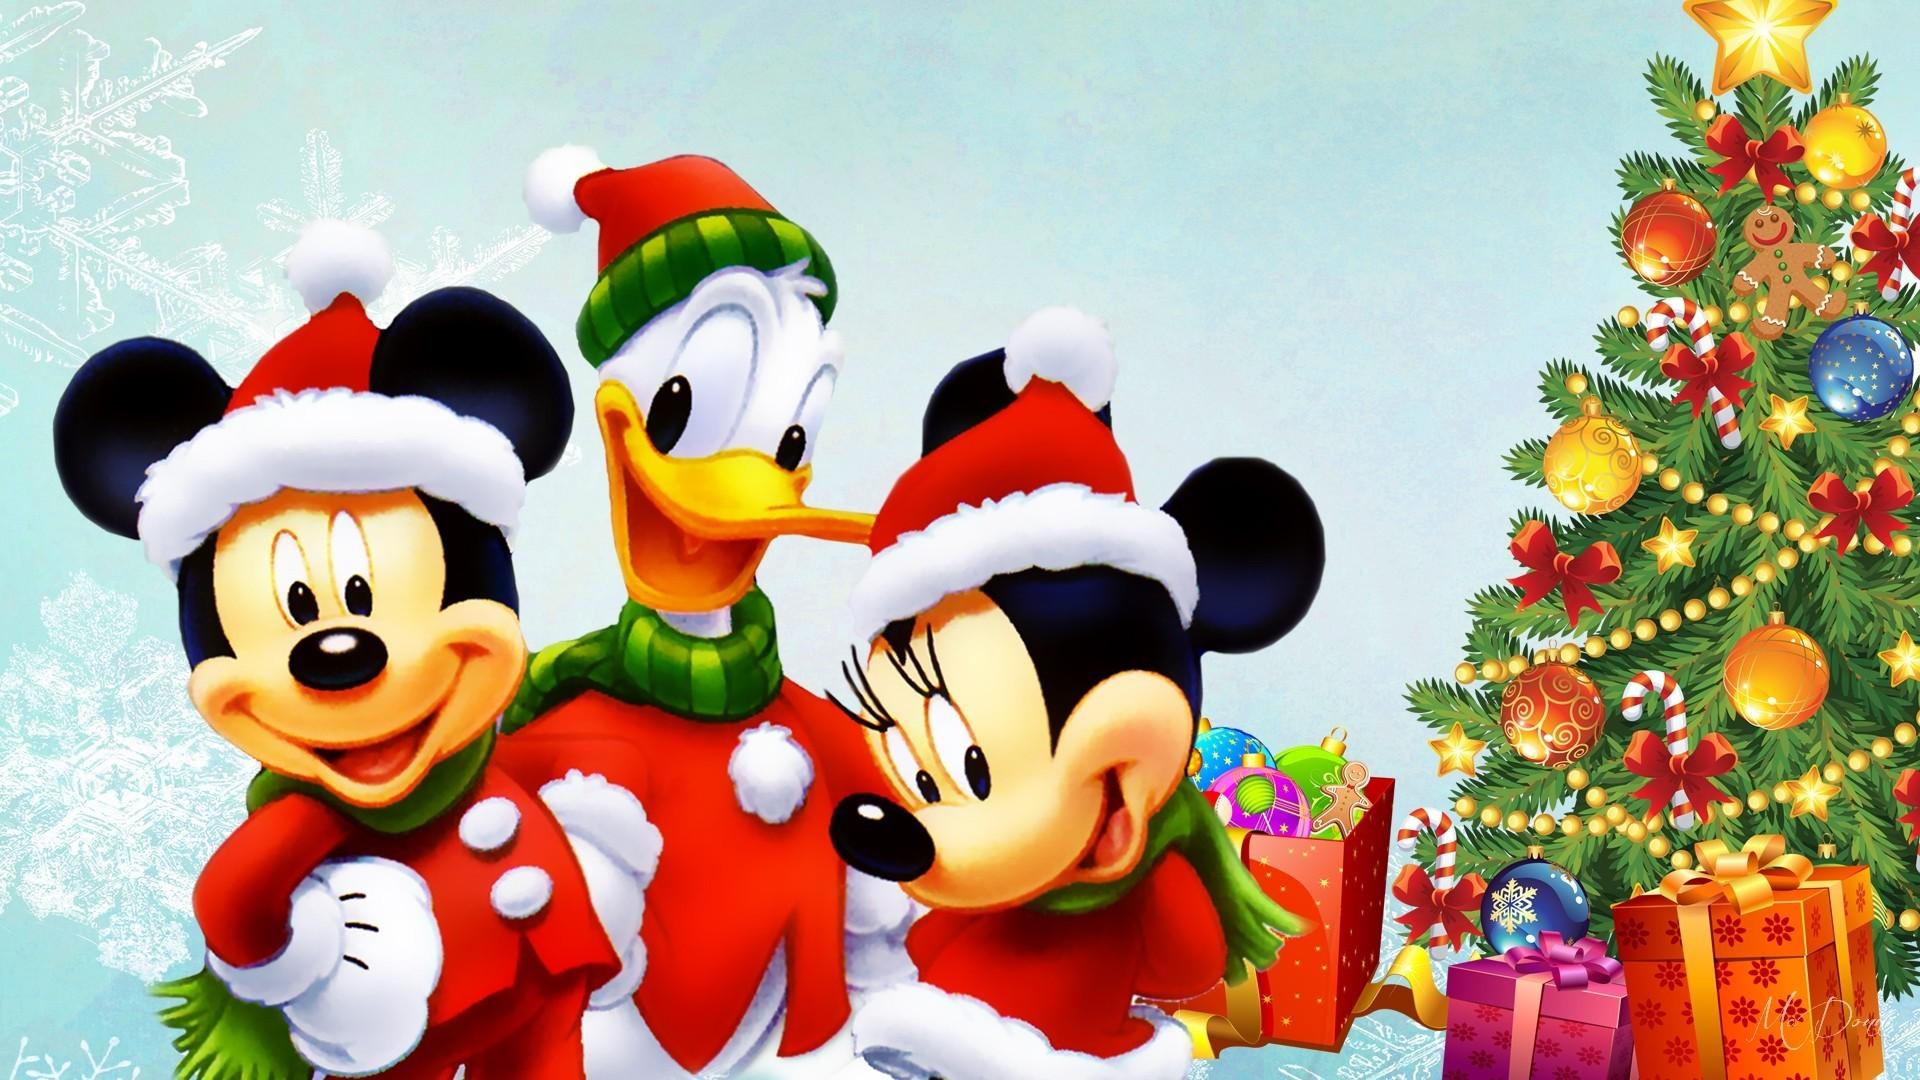 Disney Christmas Wallpaper Desktop 57 Images